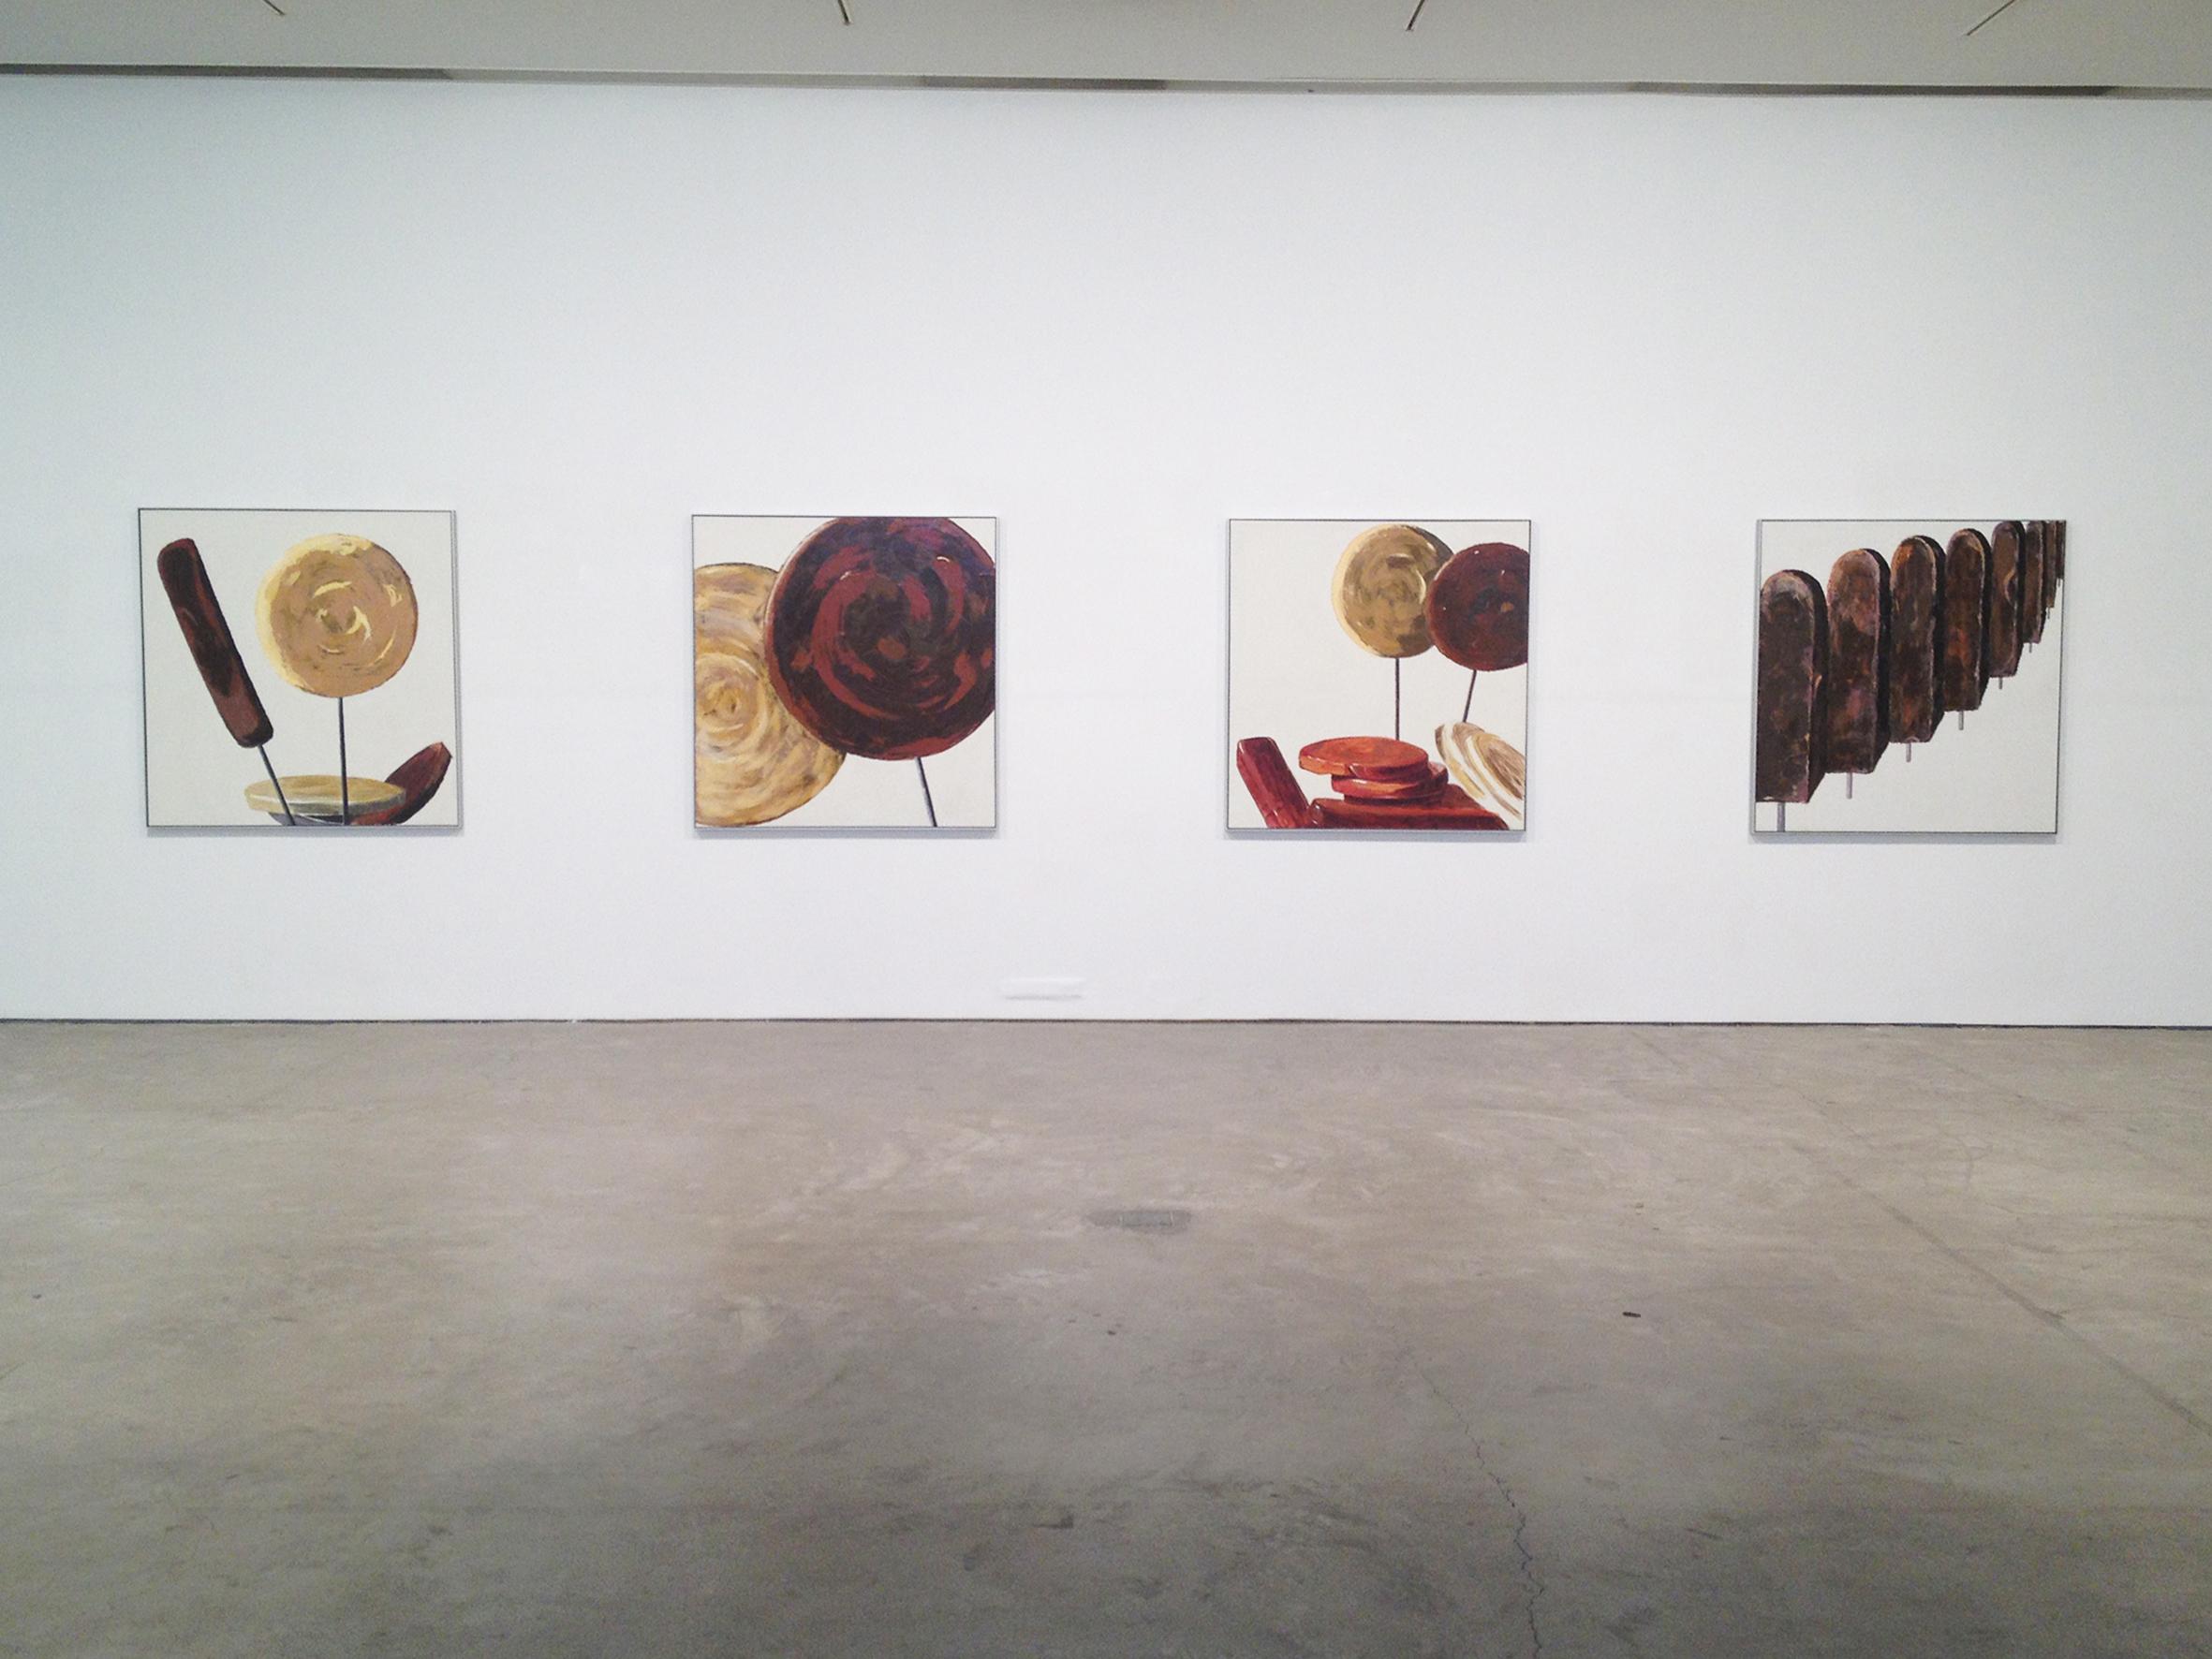 MARGARITA VITALI - SARANTOPOULOU ± Exhibition invitation, Ileana Tounta Contemporary Art Center